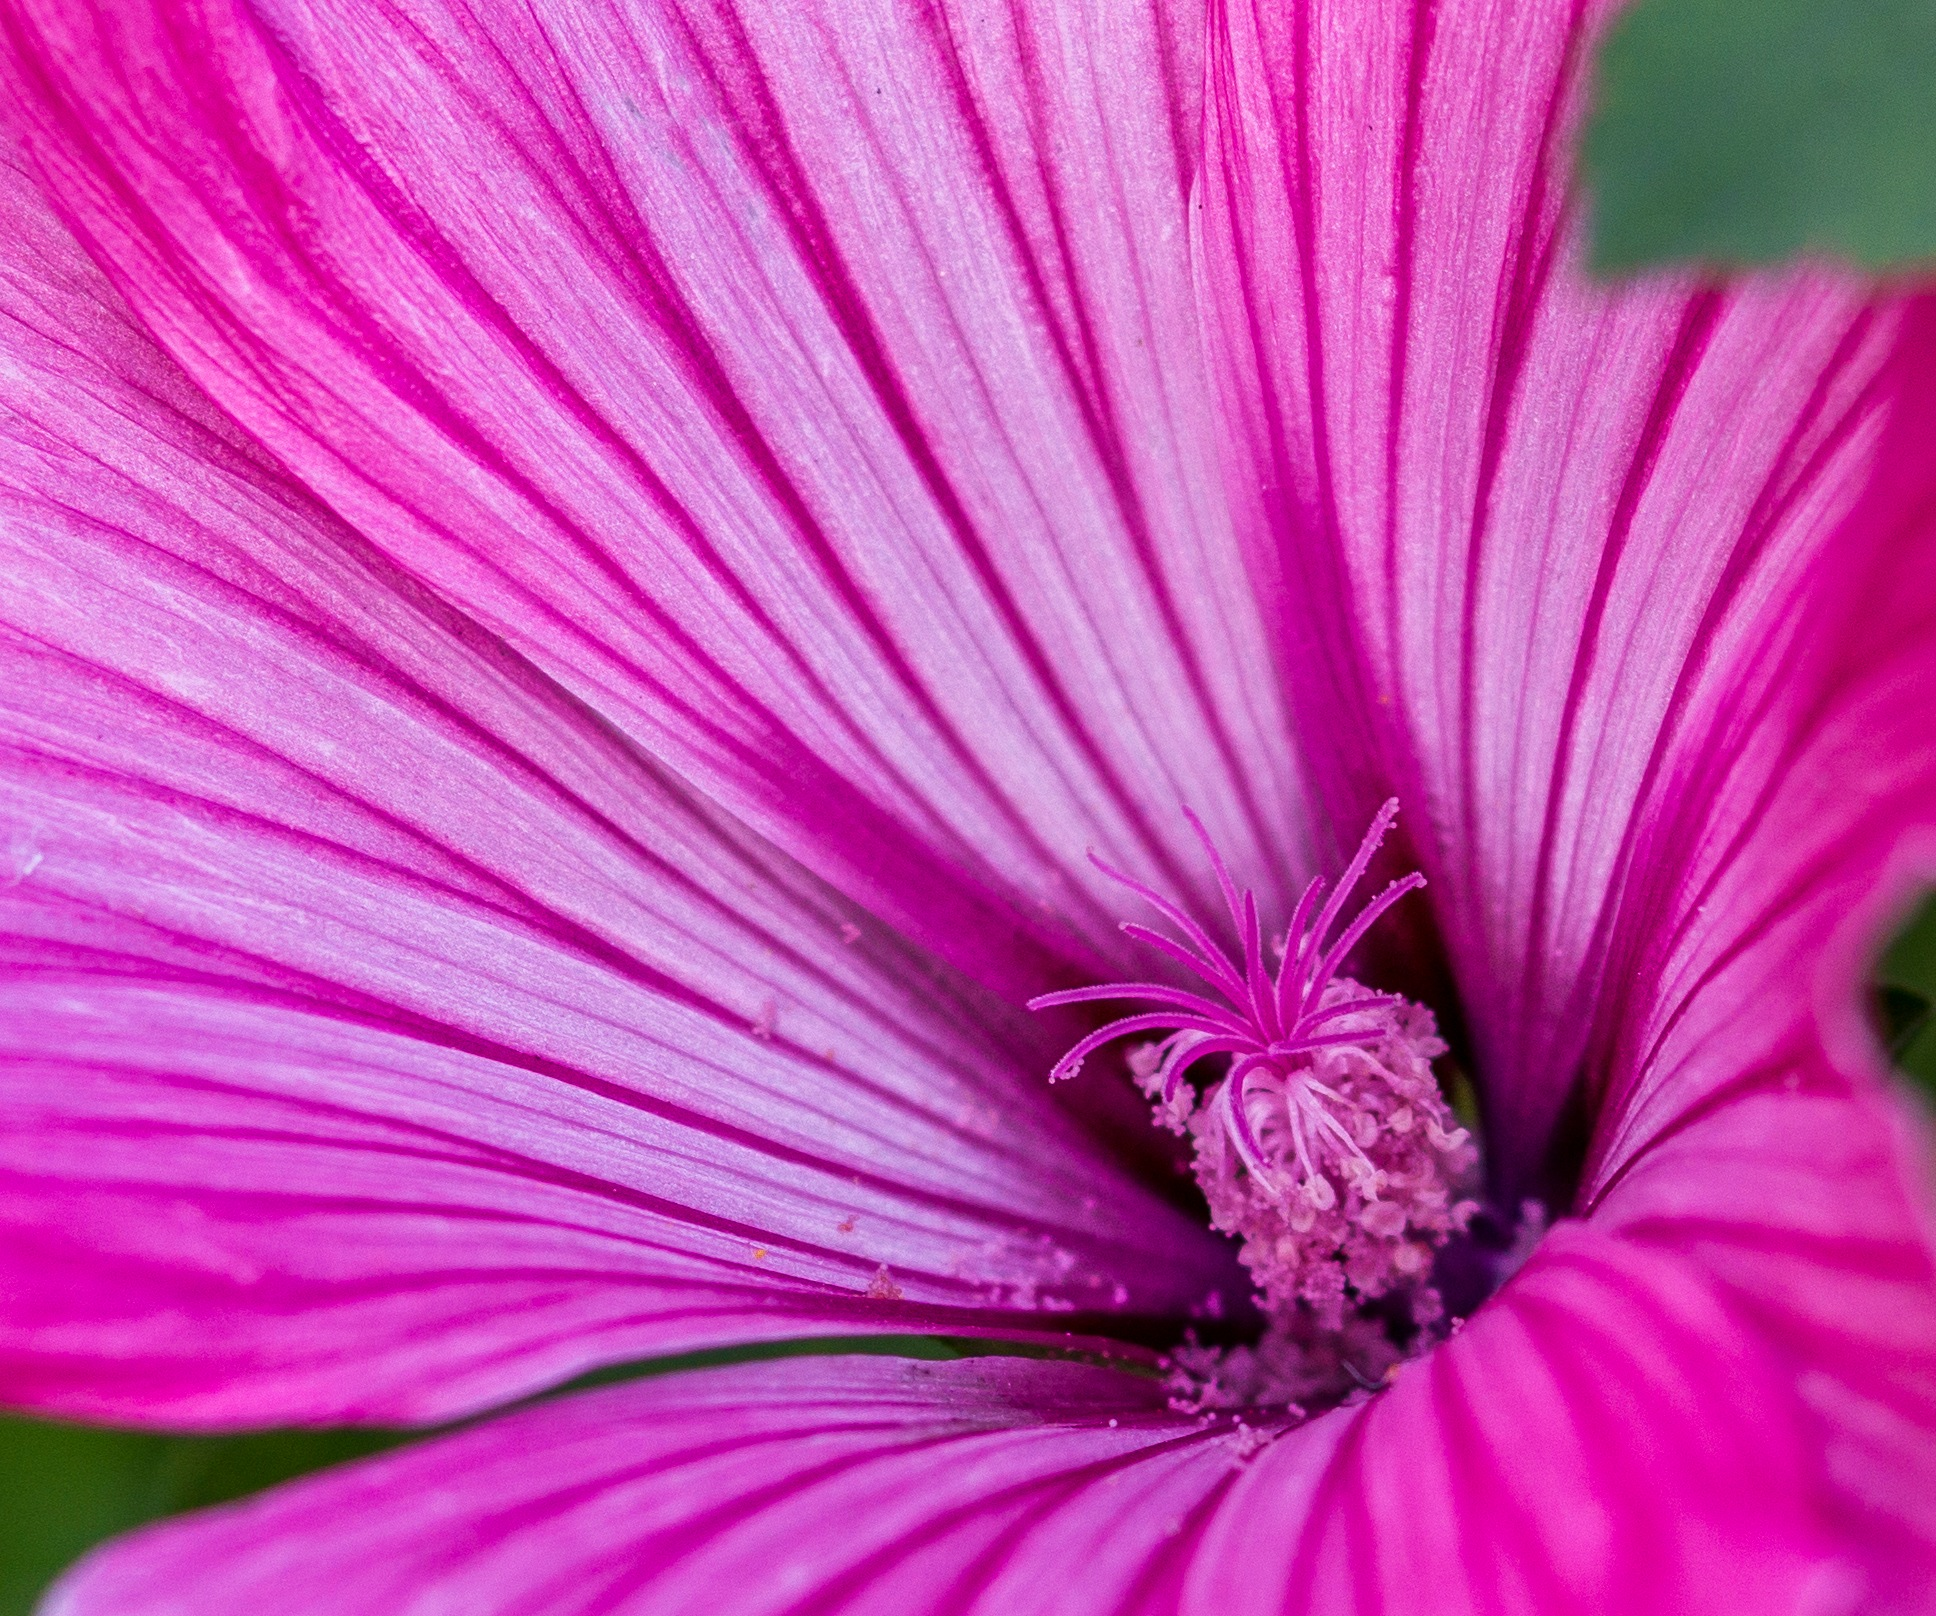 Heart of flower by Nemanja Raskovic